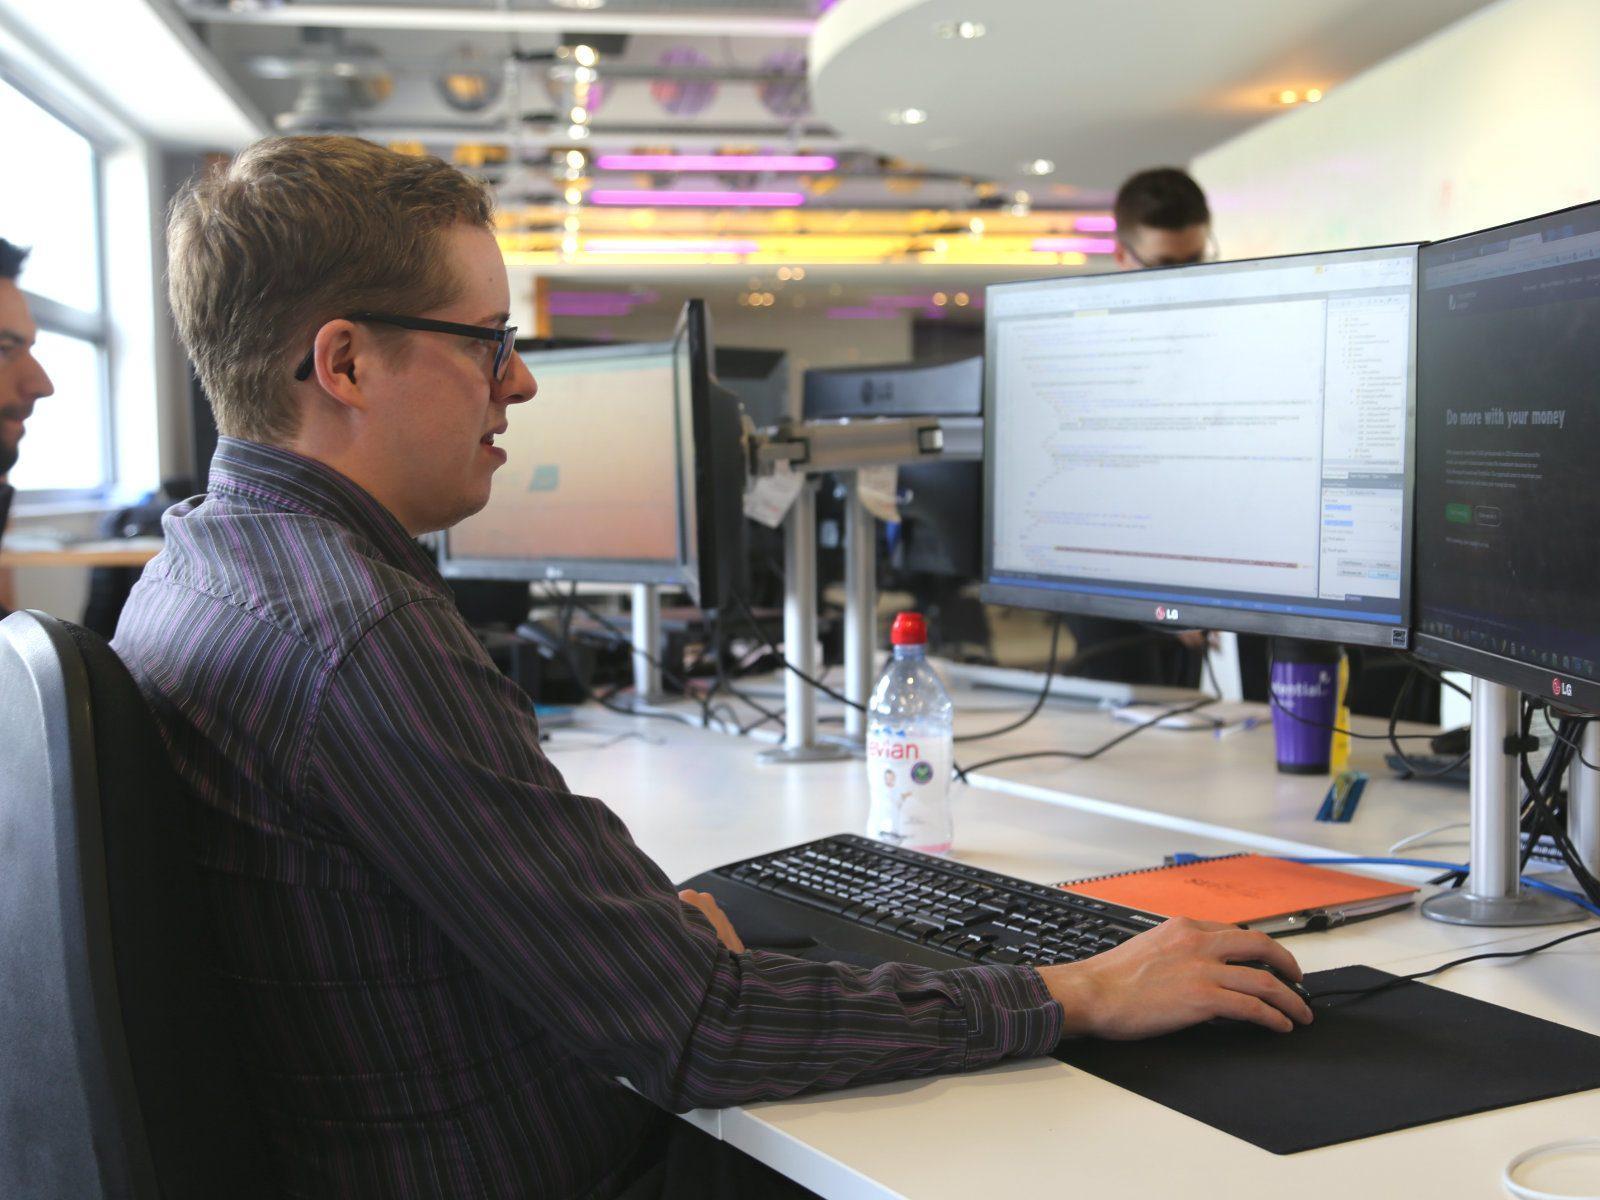 Meet the True Potential Investor team: Oliver Dutton